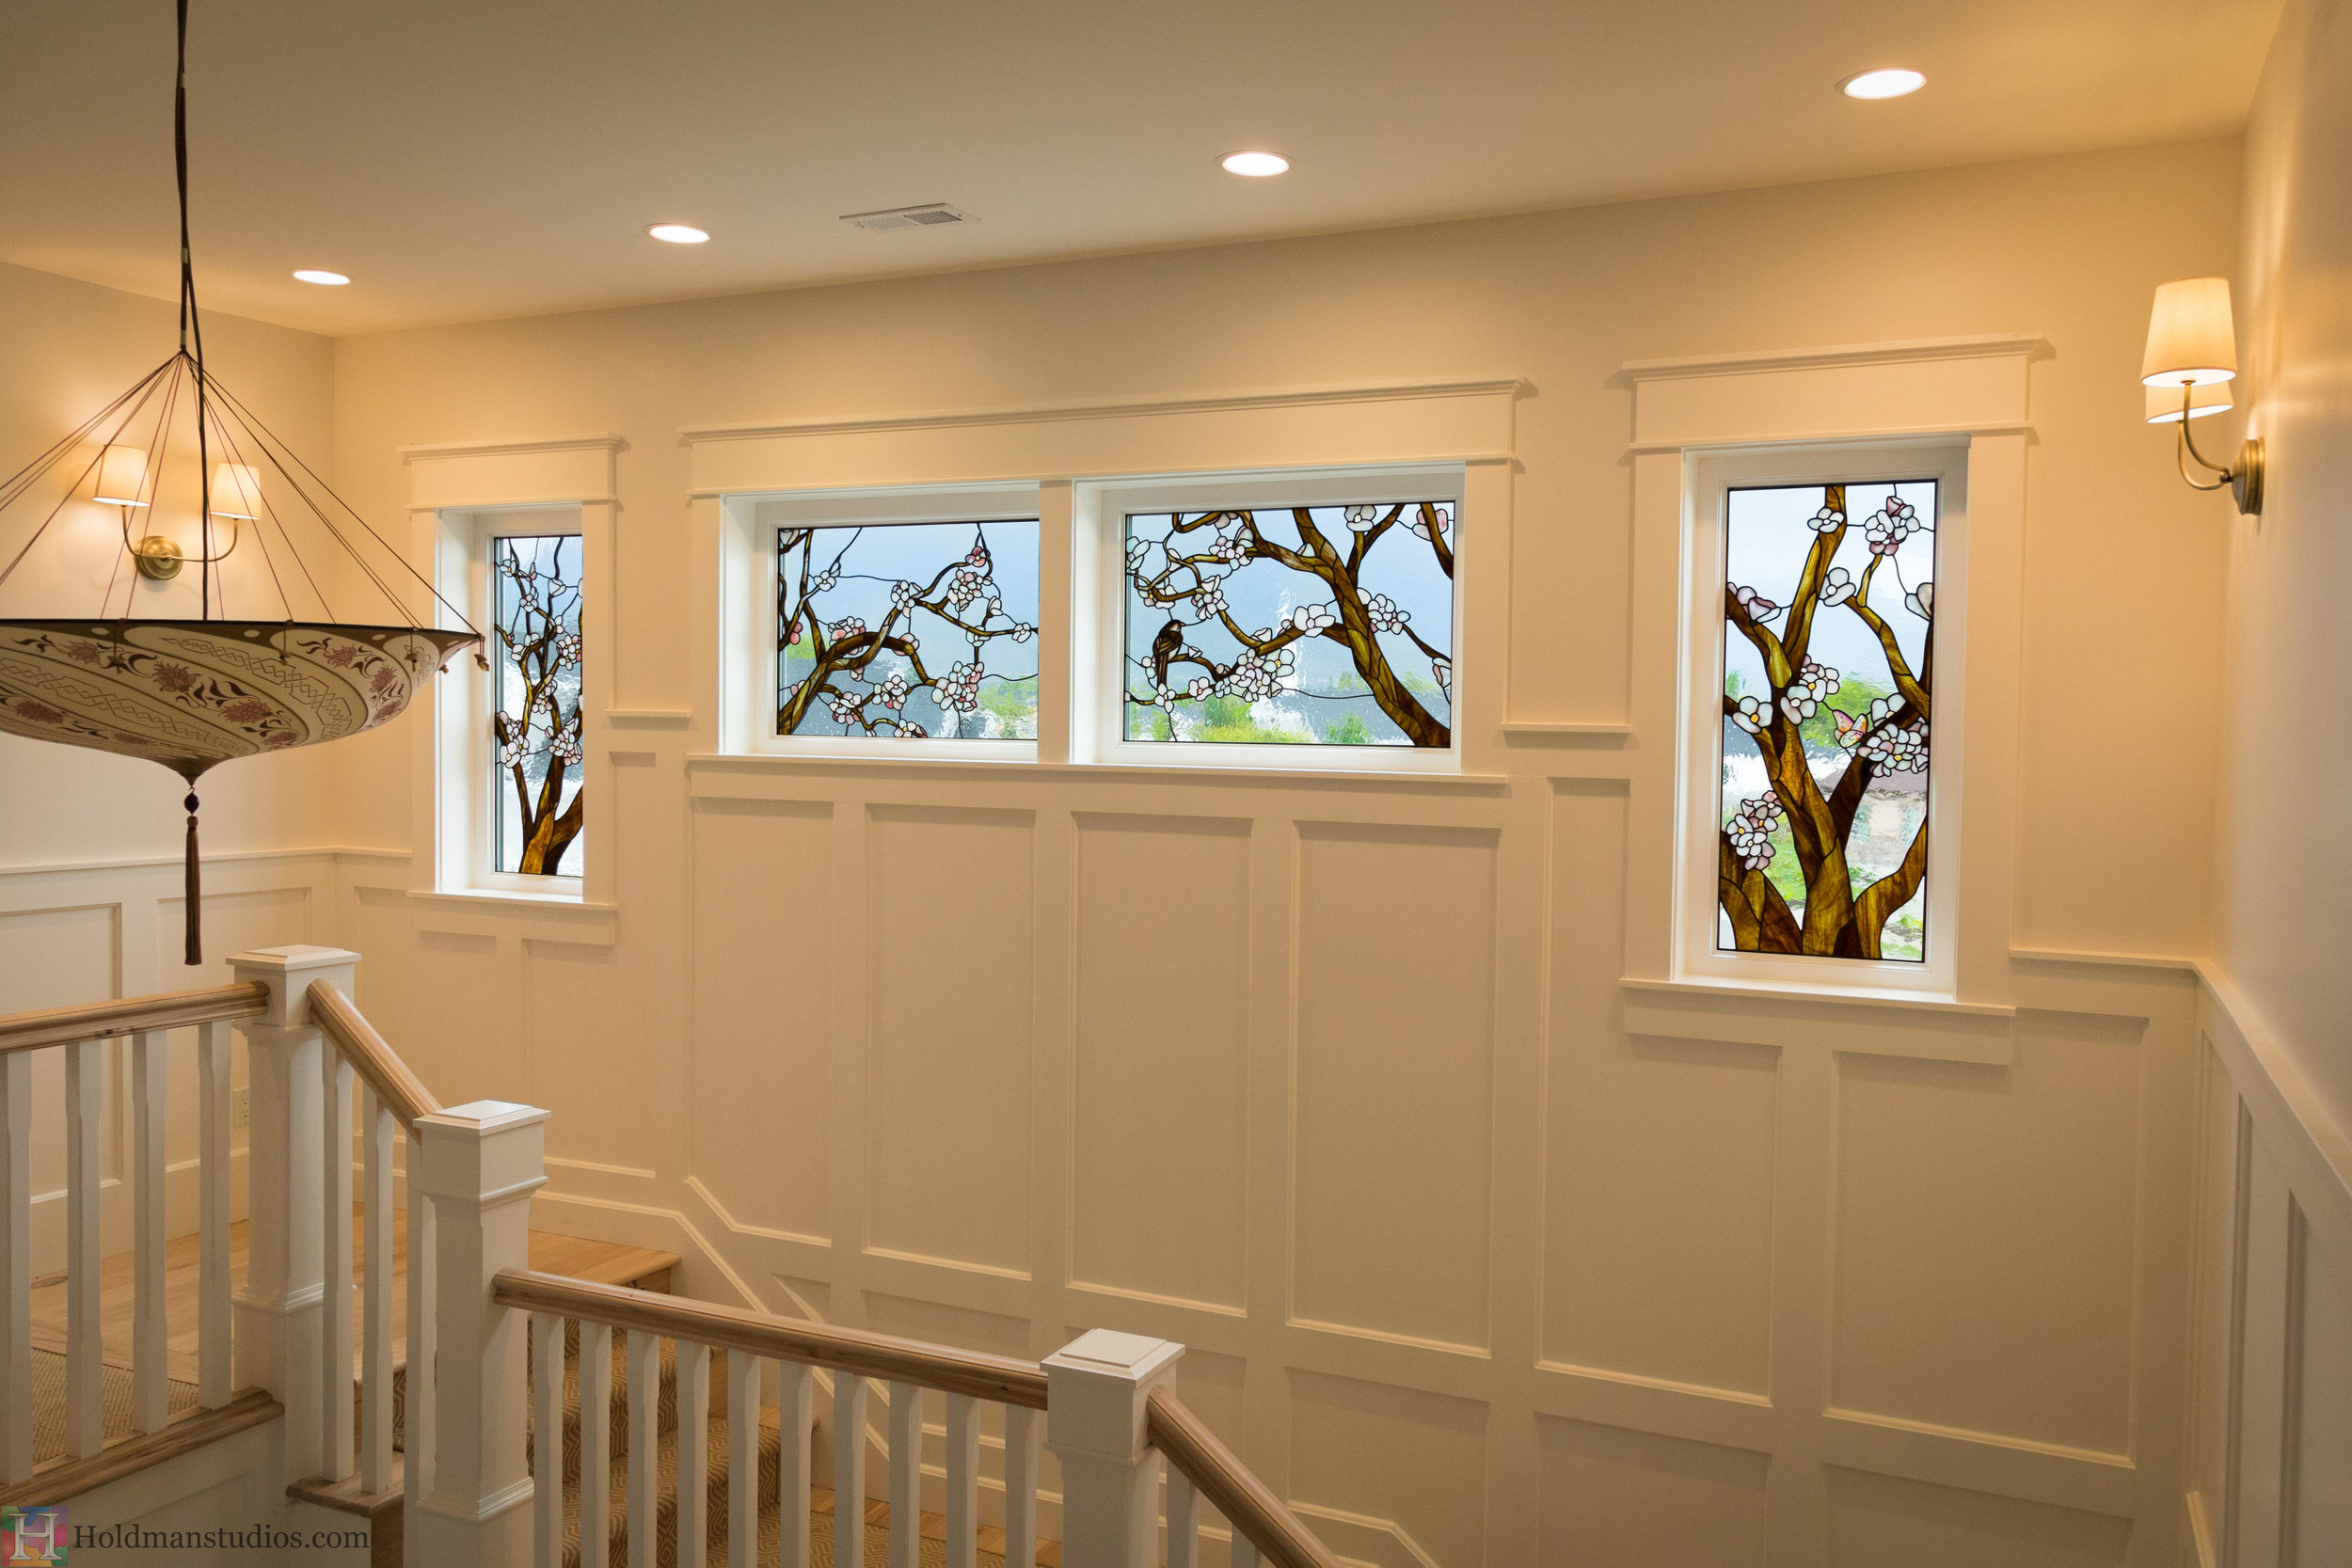 Holdman-Studios-Stained-Glass-Windows-Cherry-Tree-Branches-Blossom-Flowers-Butterflies-Brown-Bird-Sparrow.jpg